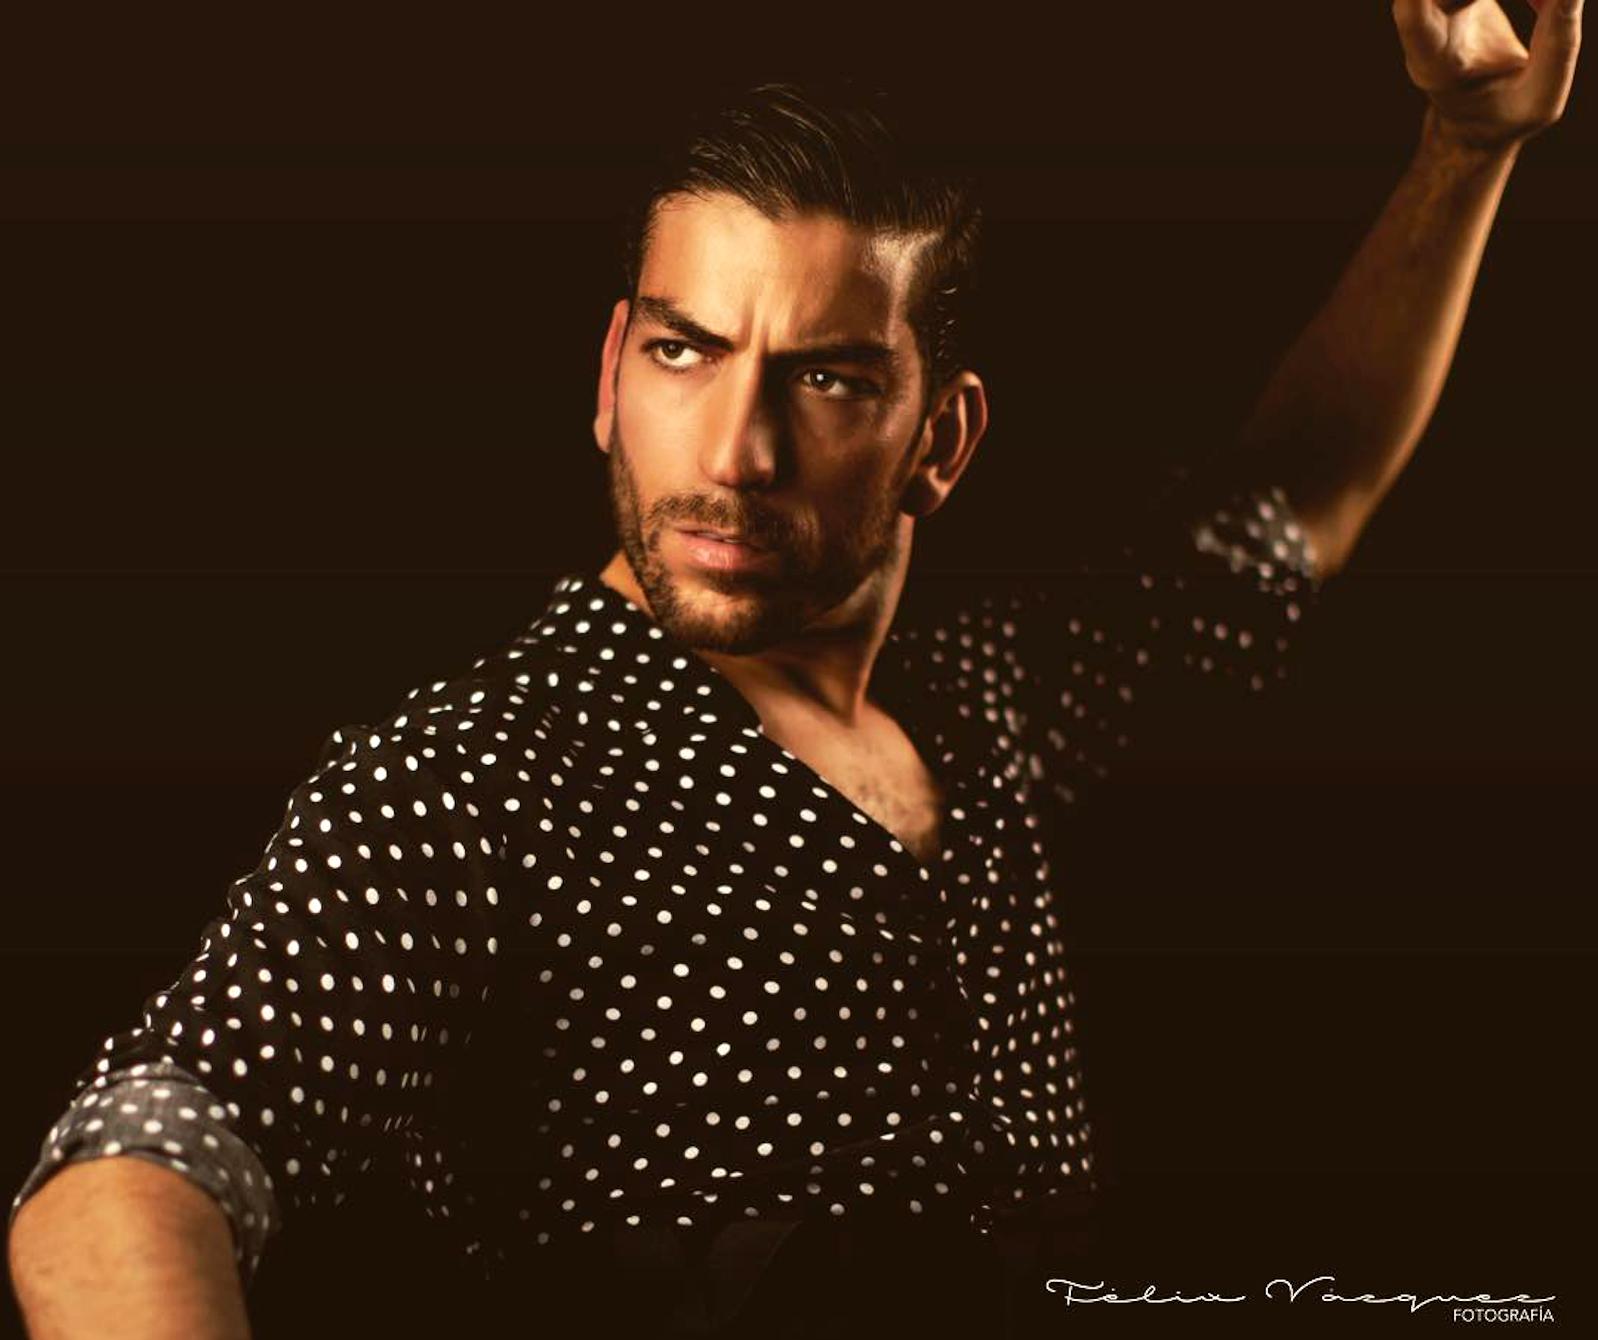 El baile flamenco masculino